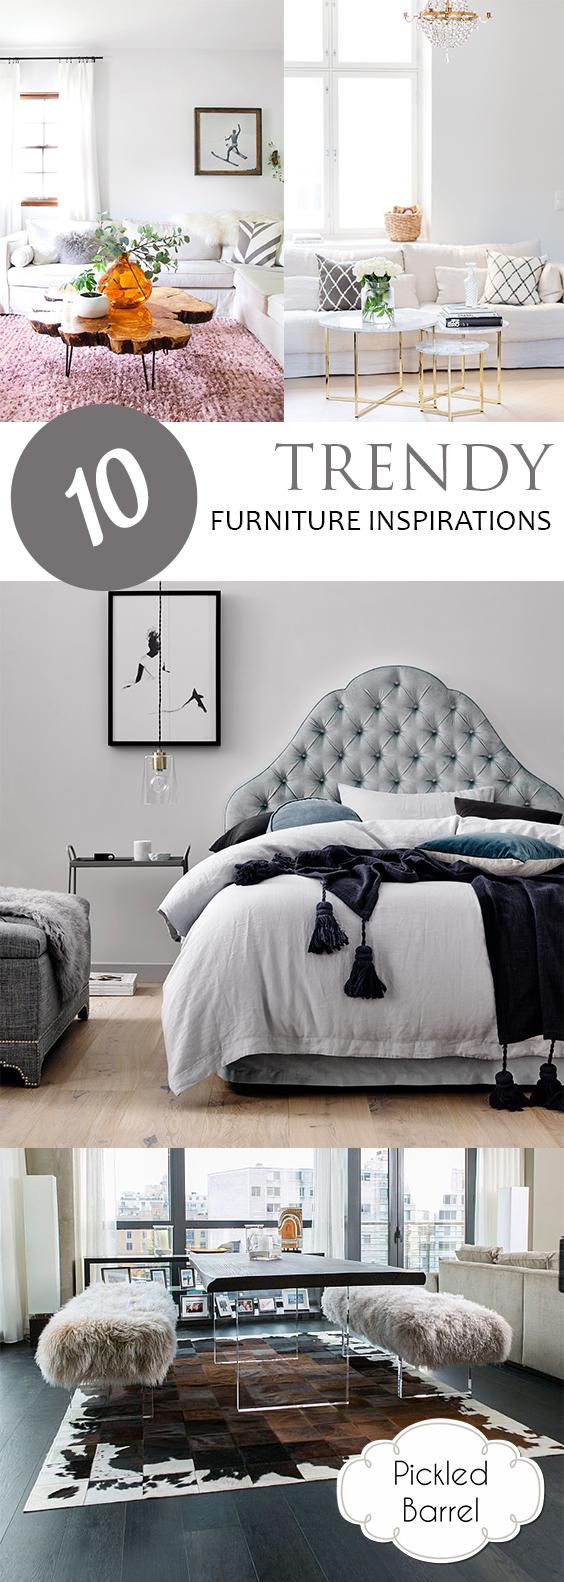 10 Trendy Furniture Inspirations| Furniture, DIY Furniture Projects, Furniture Tips and Tricks, Furniture Projects, DIY Furniture Projects, DIY Home, DIY Home Decor, Home Decor Hacks, Popular Pin